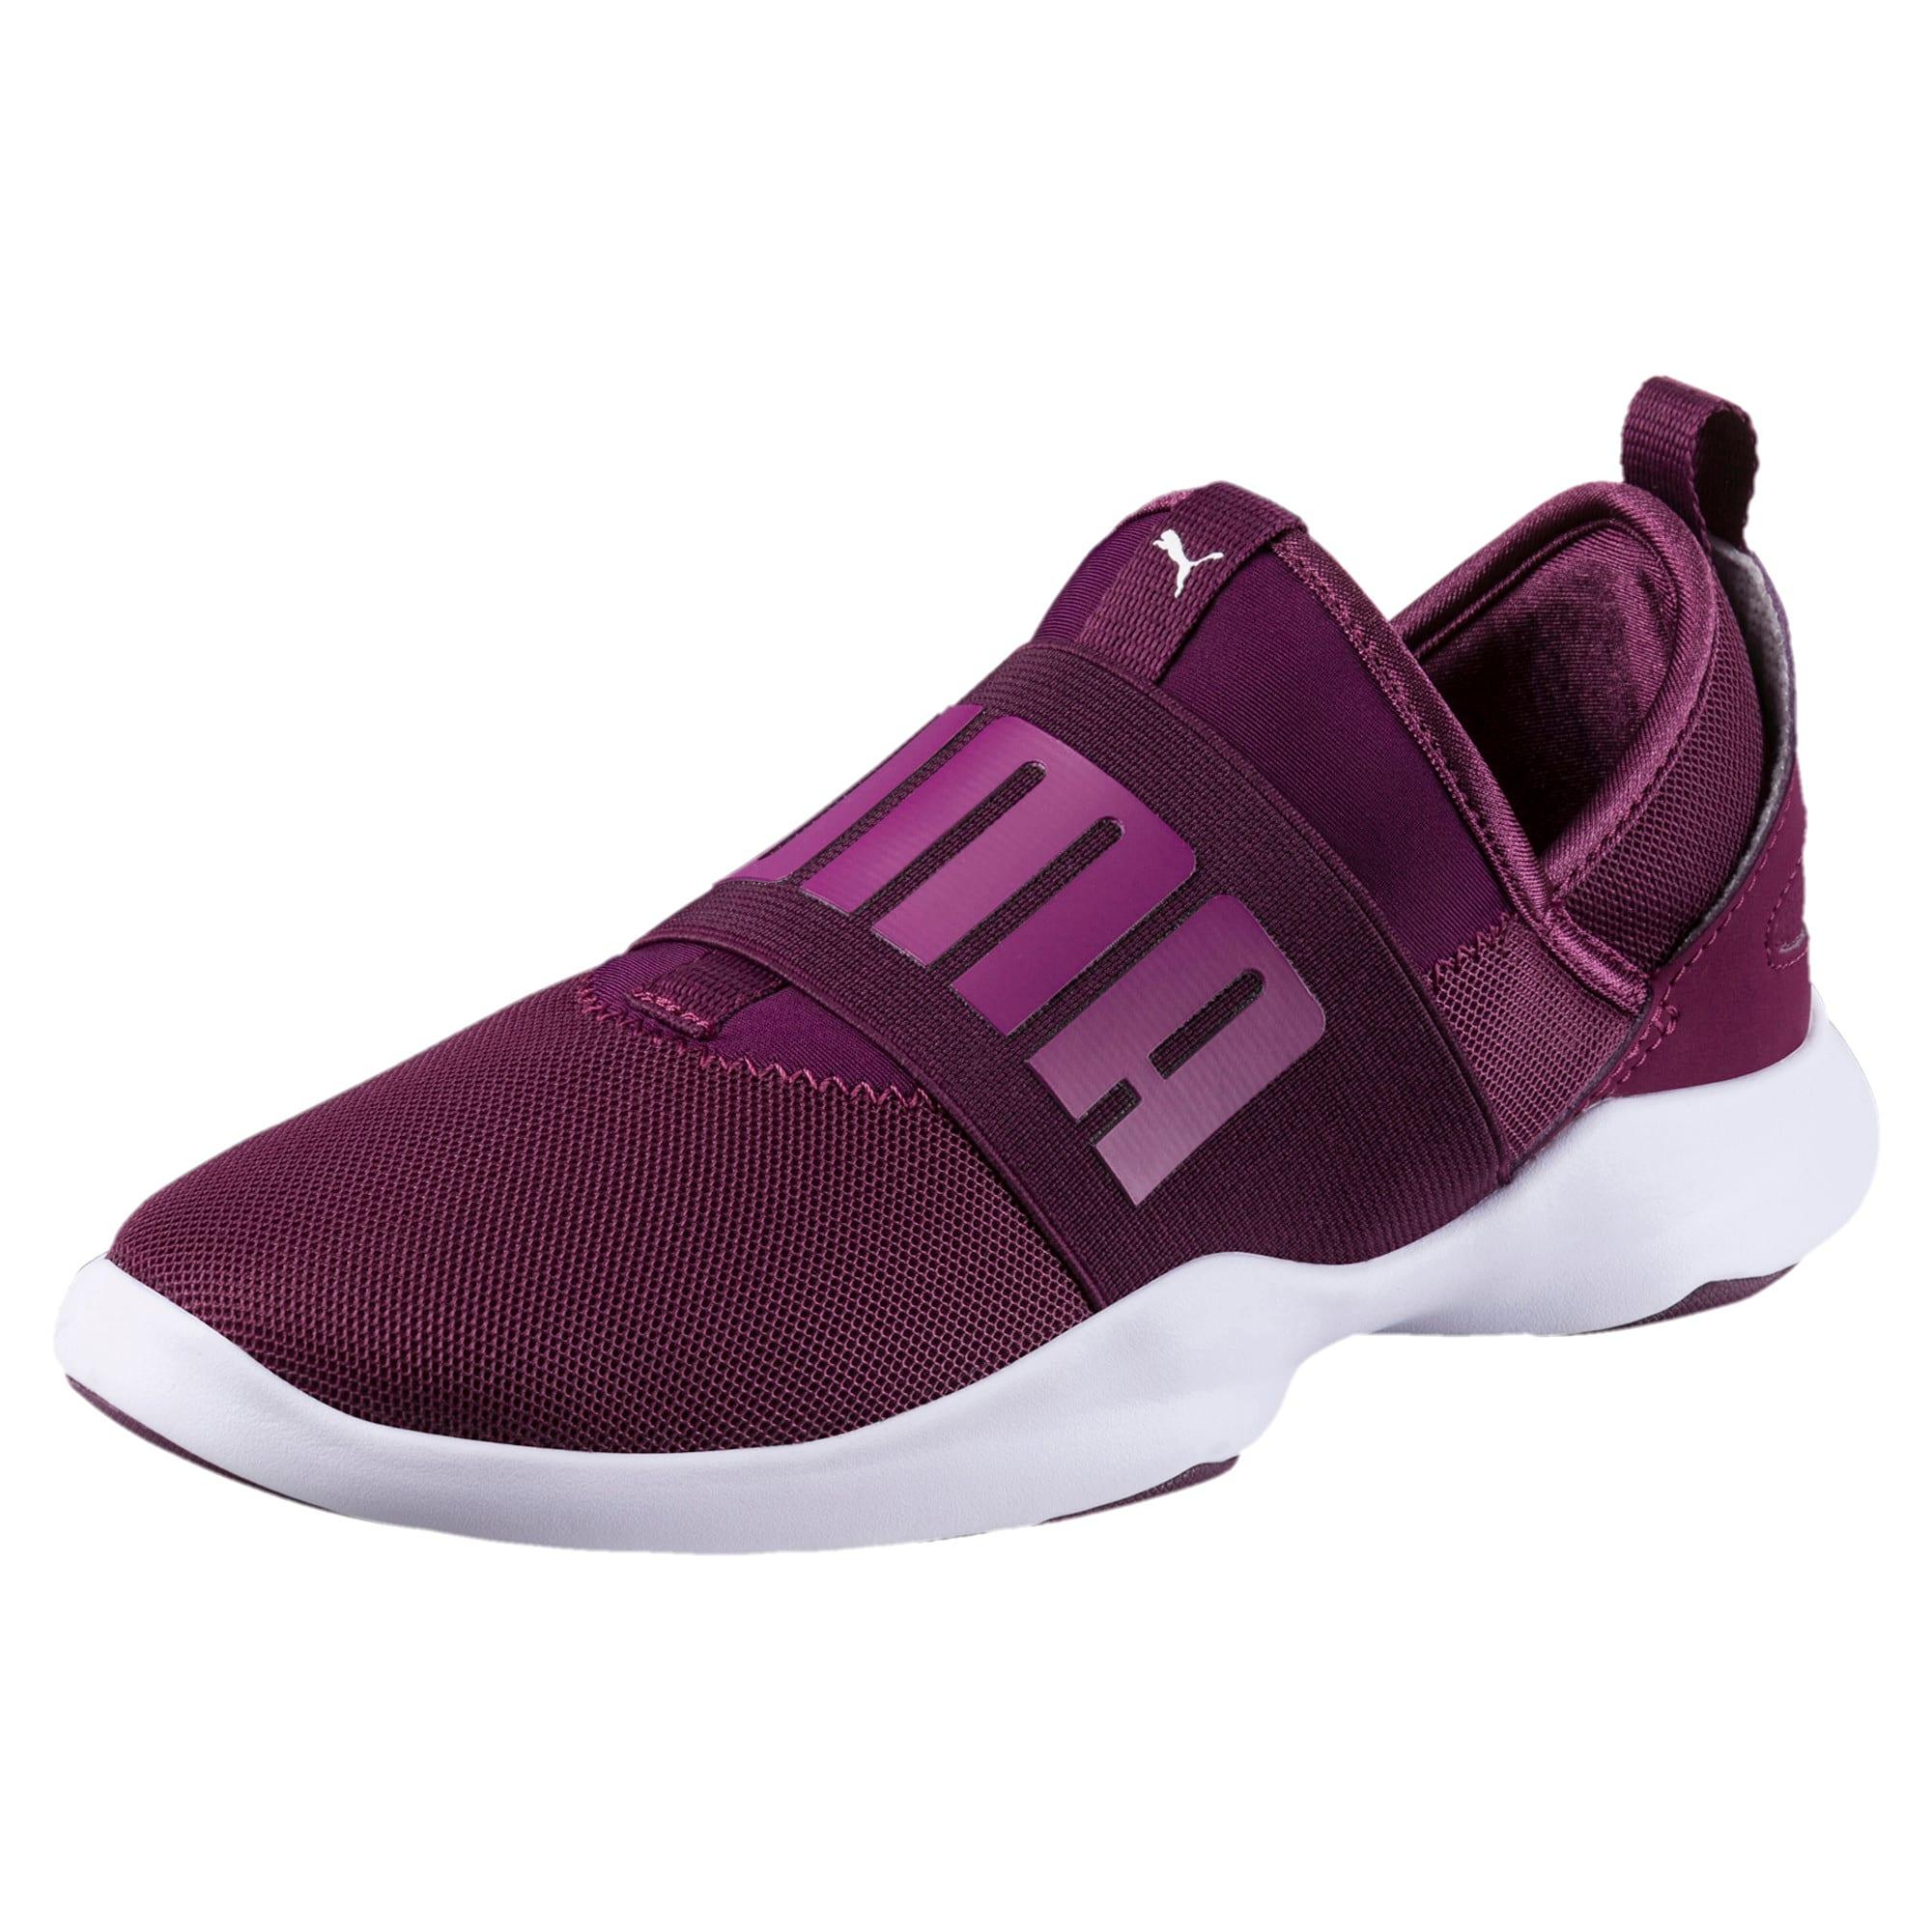 Thumbnail 1 of Dare Unisex Training Shoes, Dark Purple-Dark Purple, medium